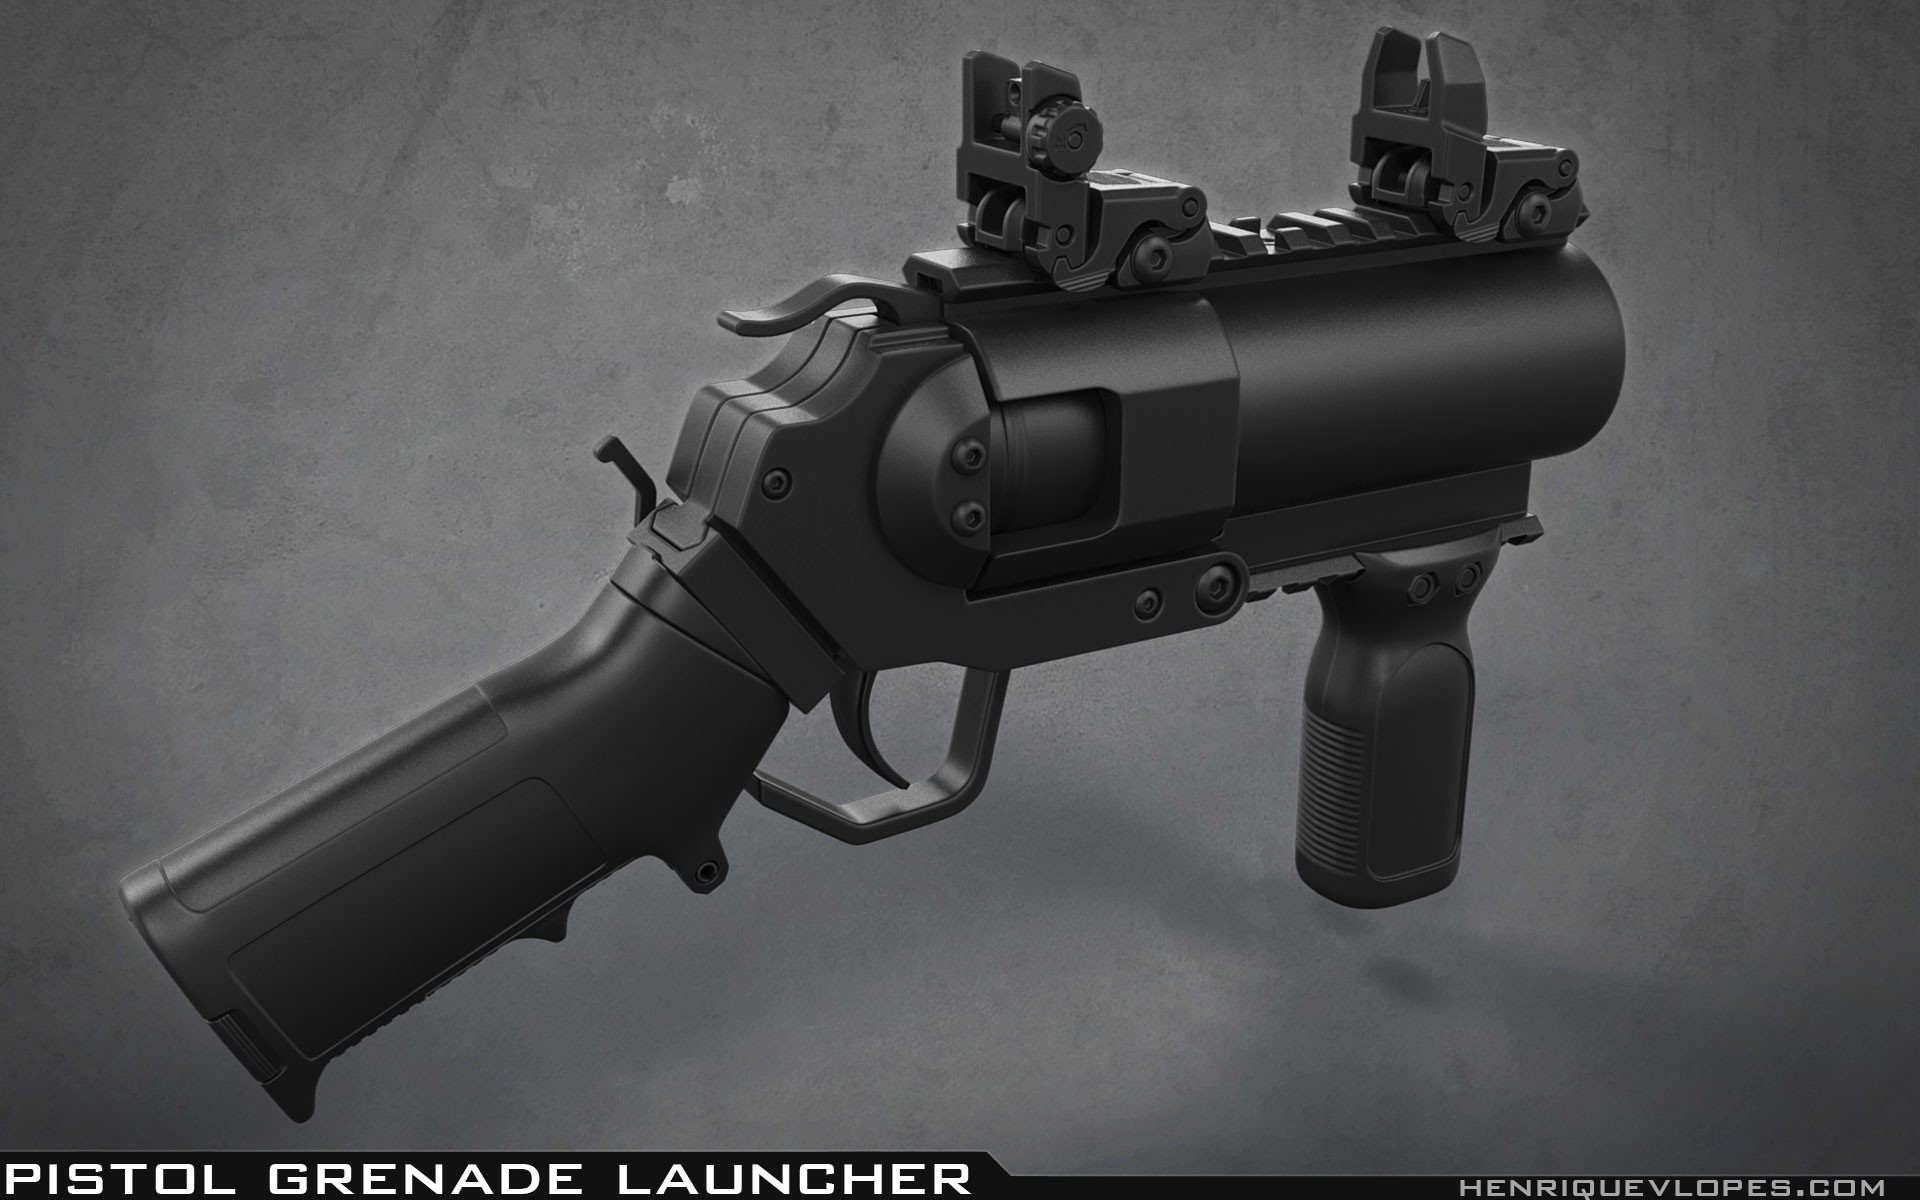 Henrique lopes pistol grenade launcher high 01